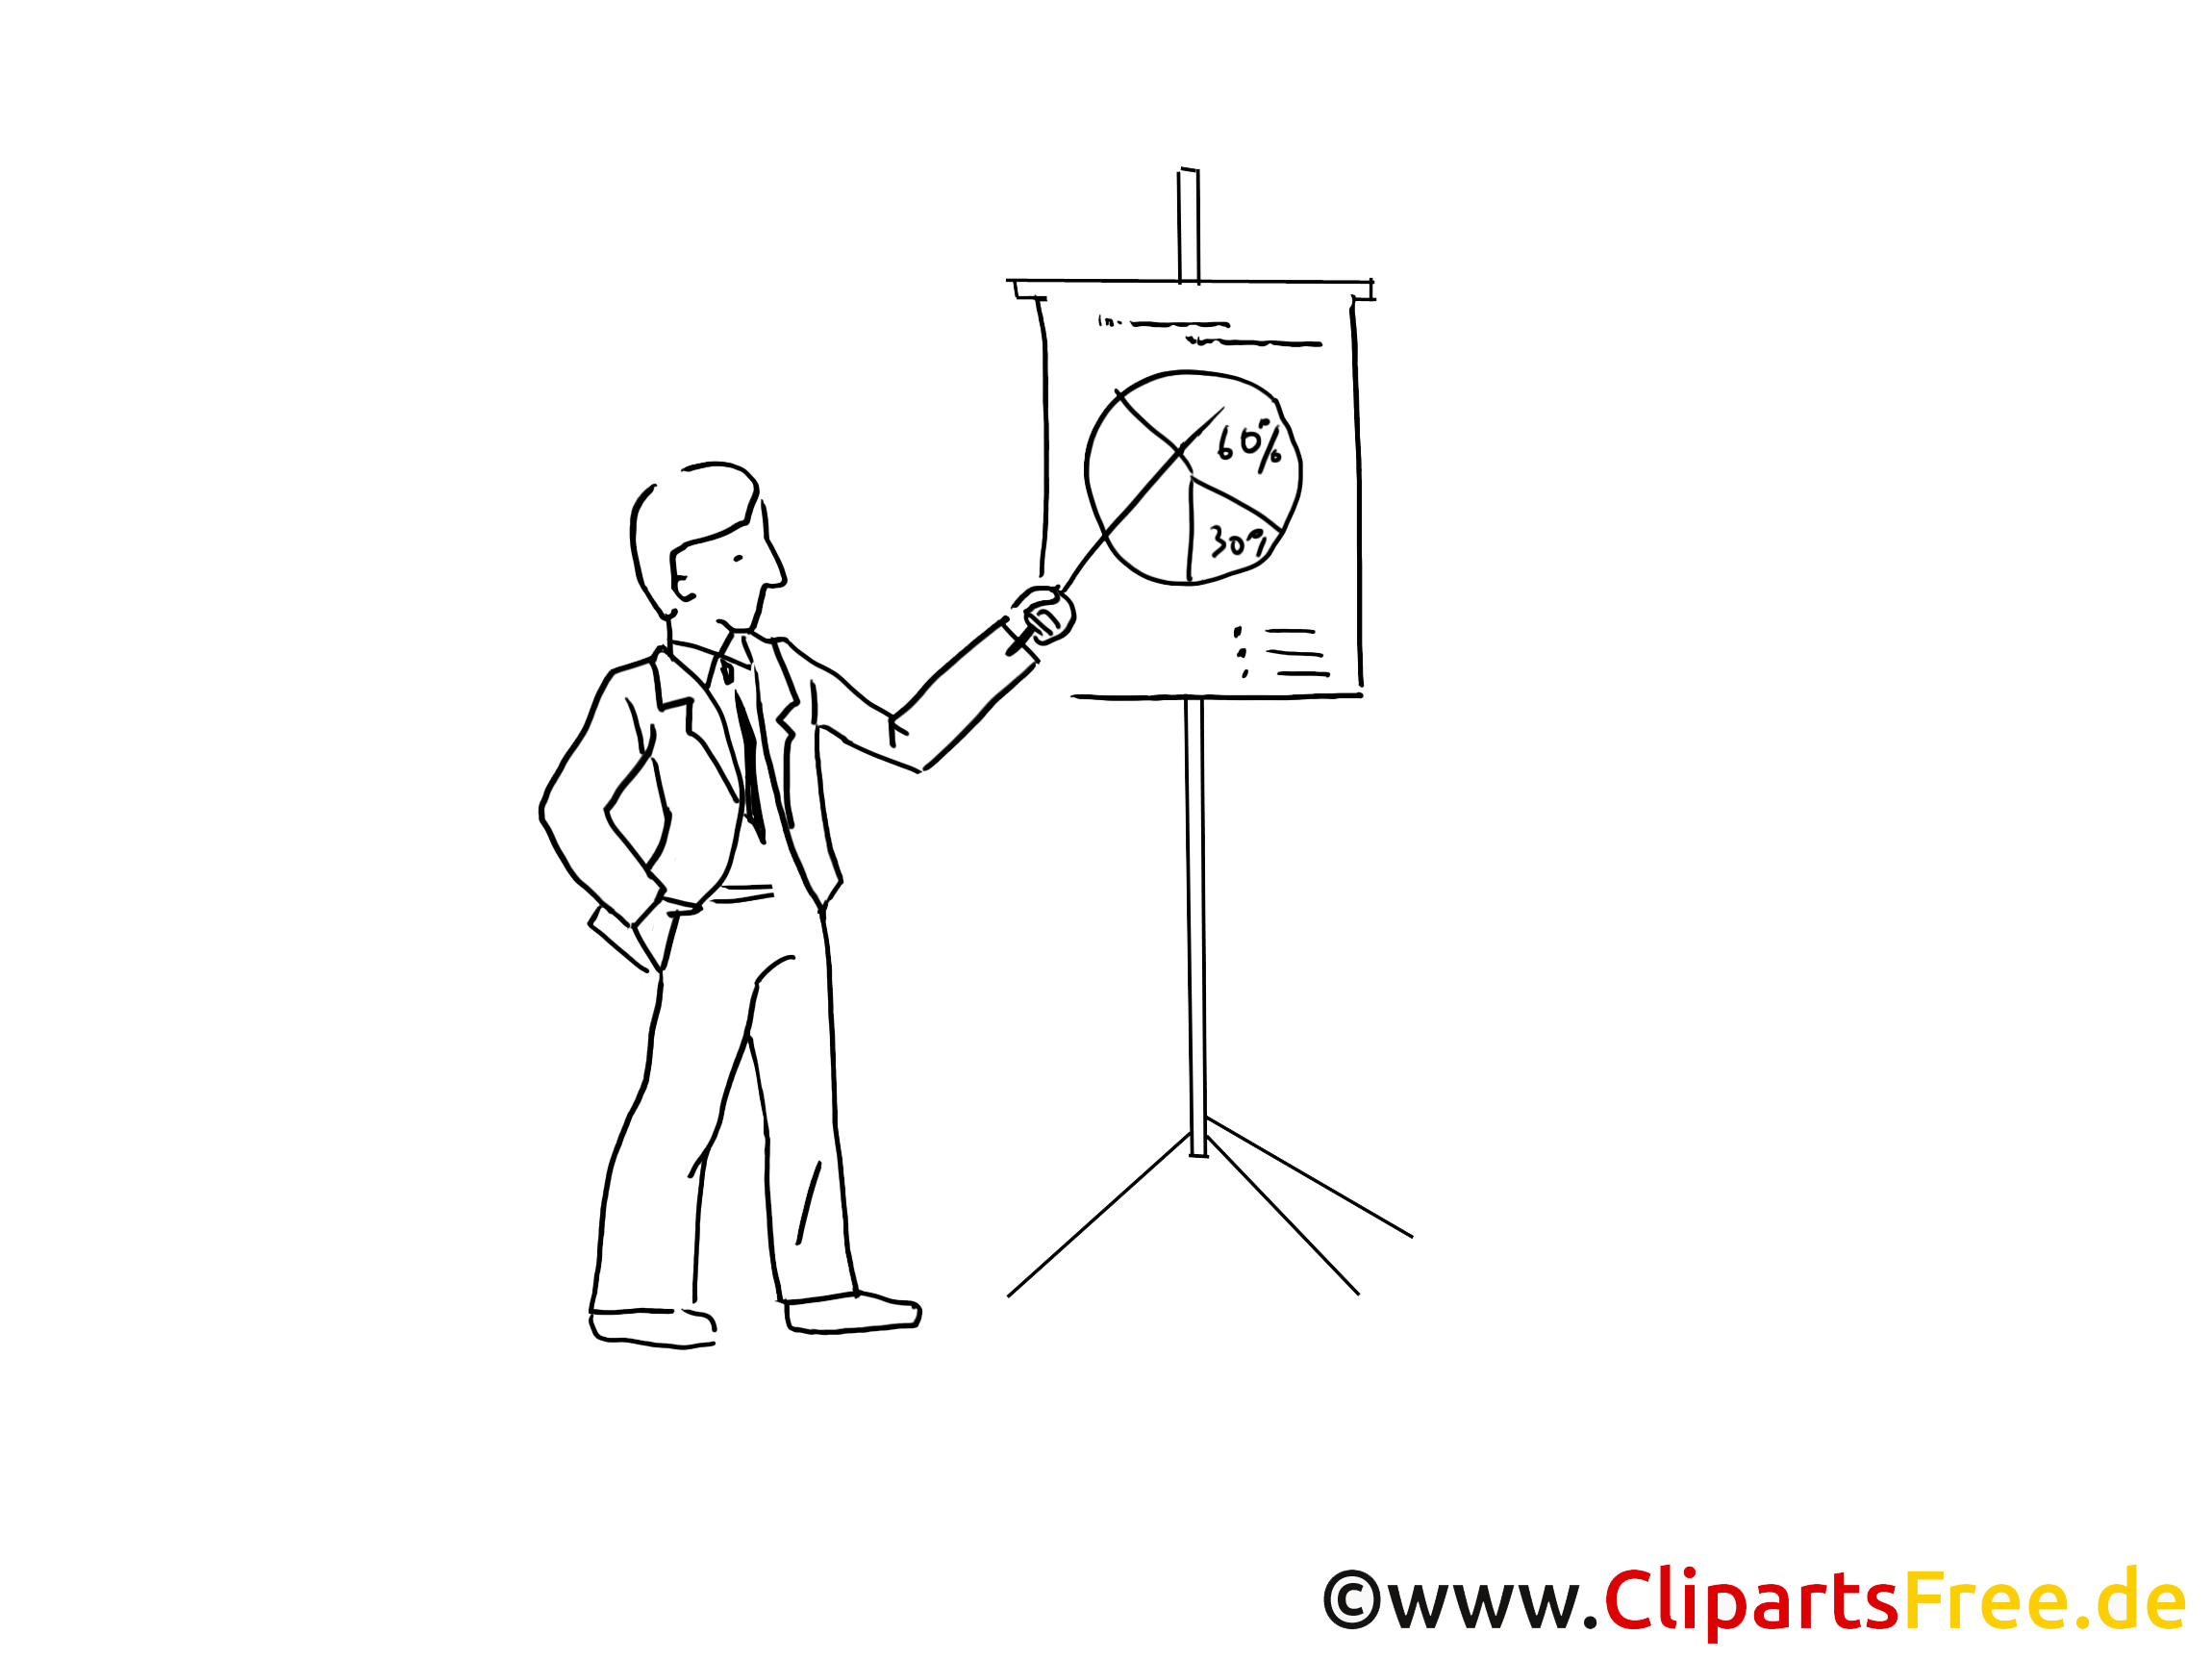 clipart kostenlos präsentation - photo #17